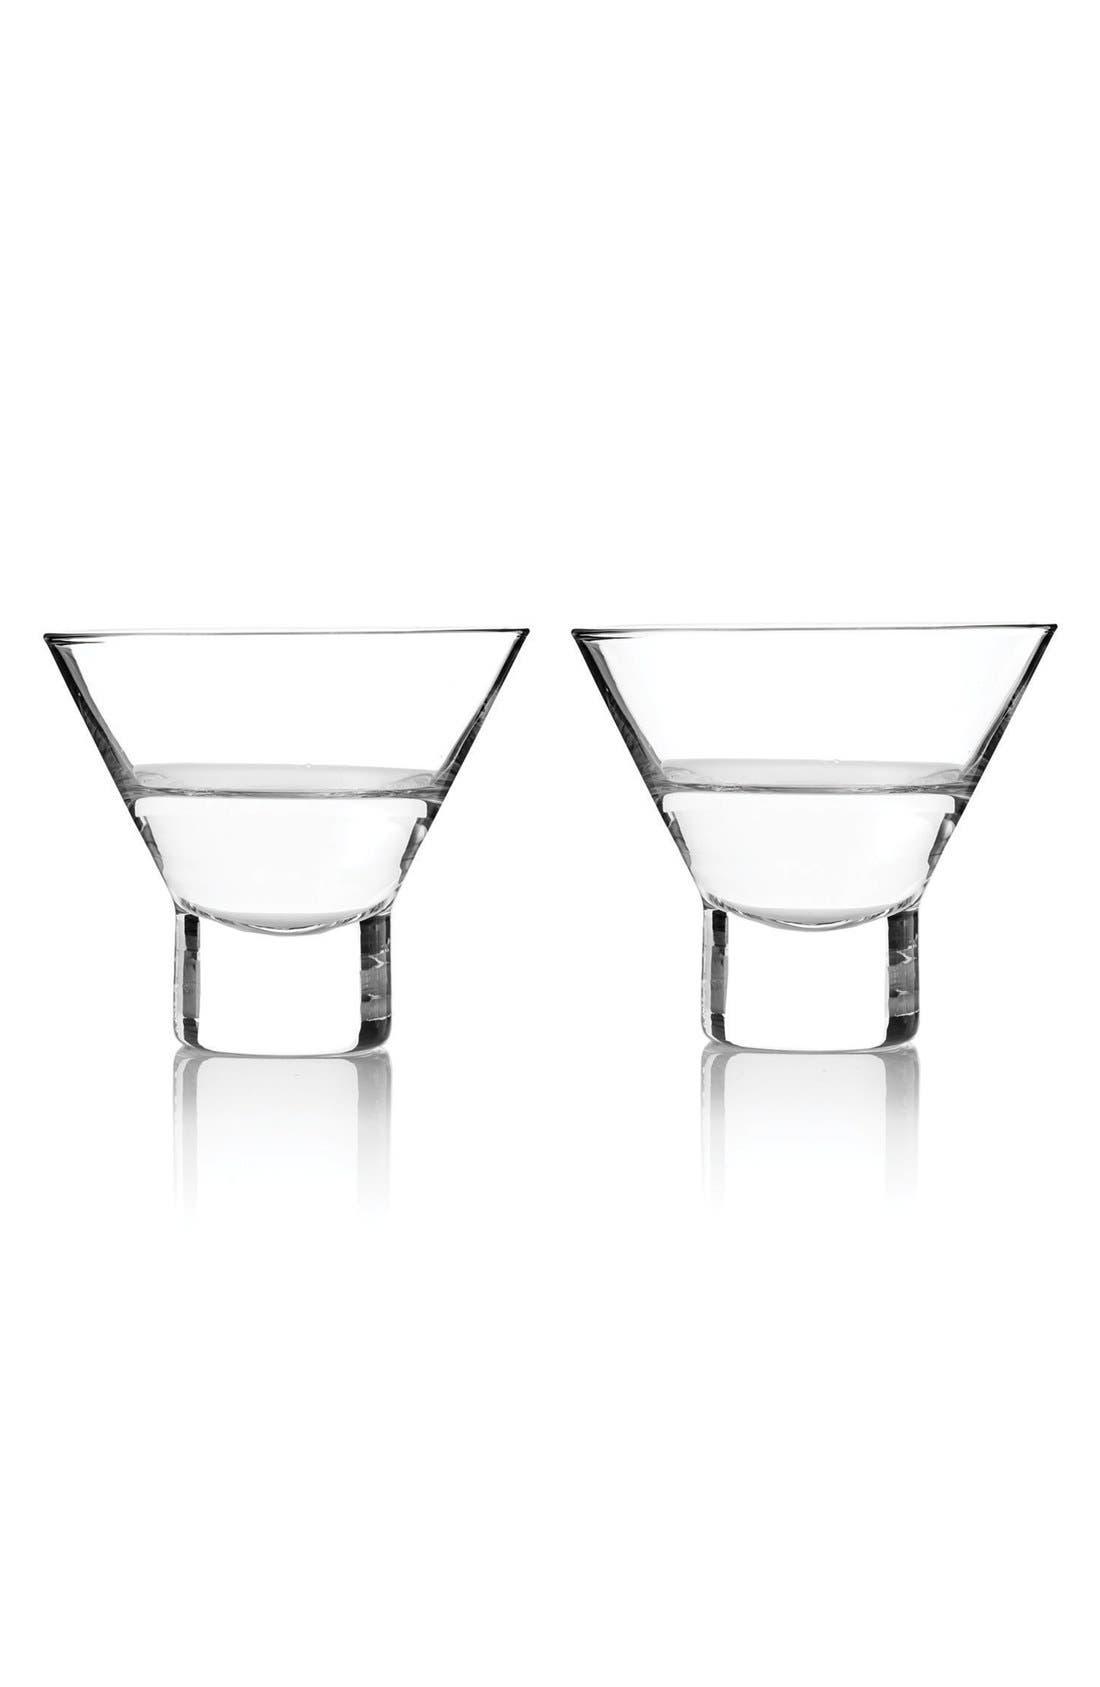 true fabrications Stemless Martini Glasses (Set of 2)